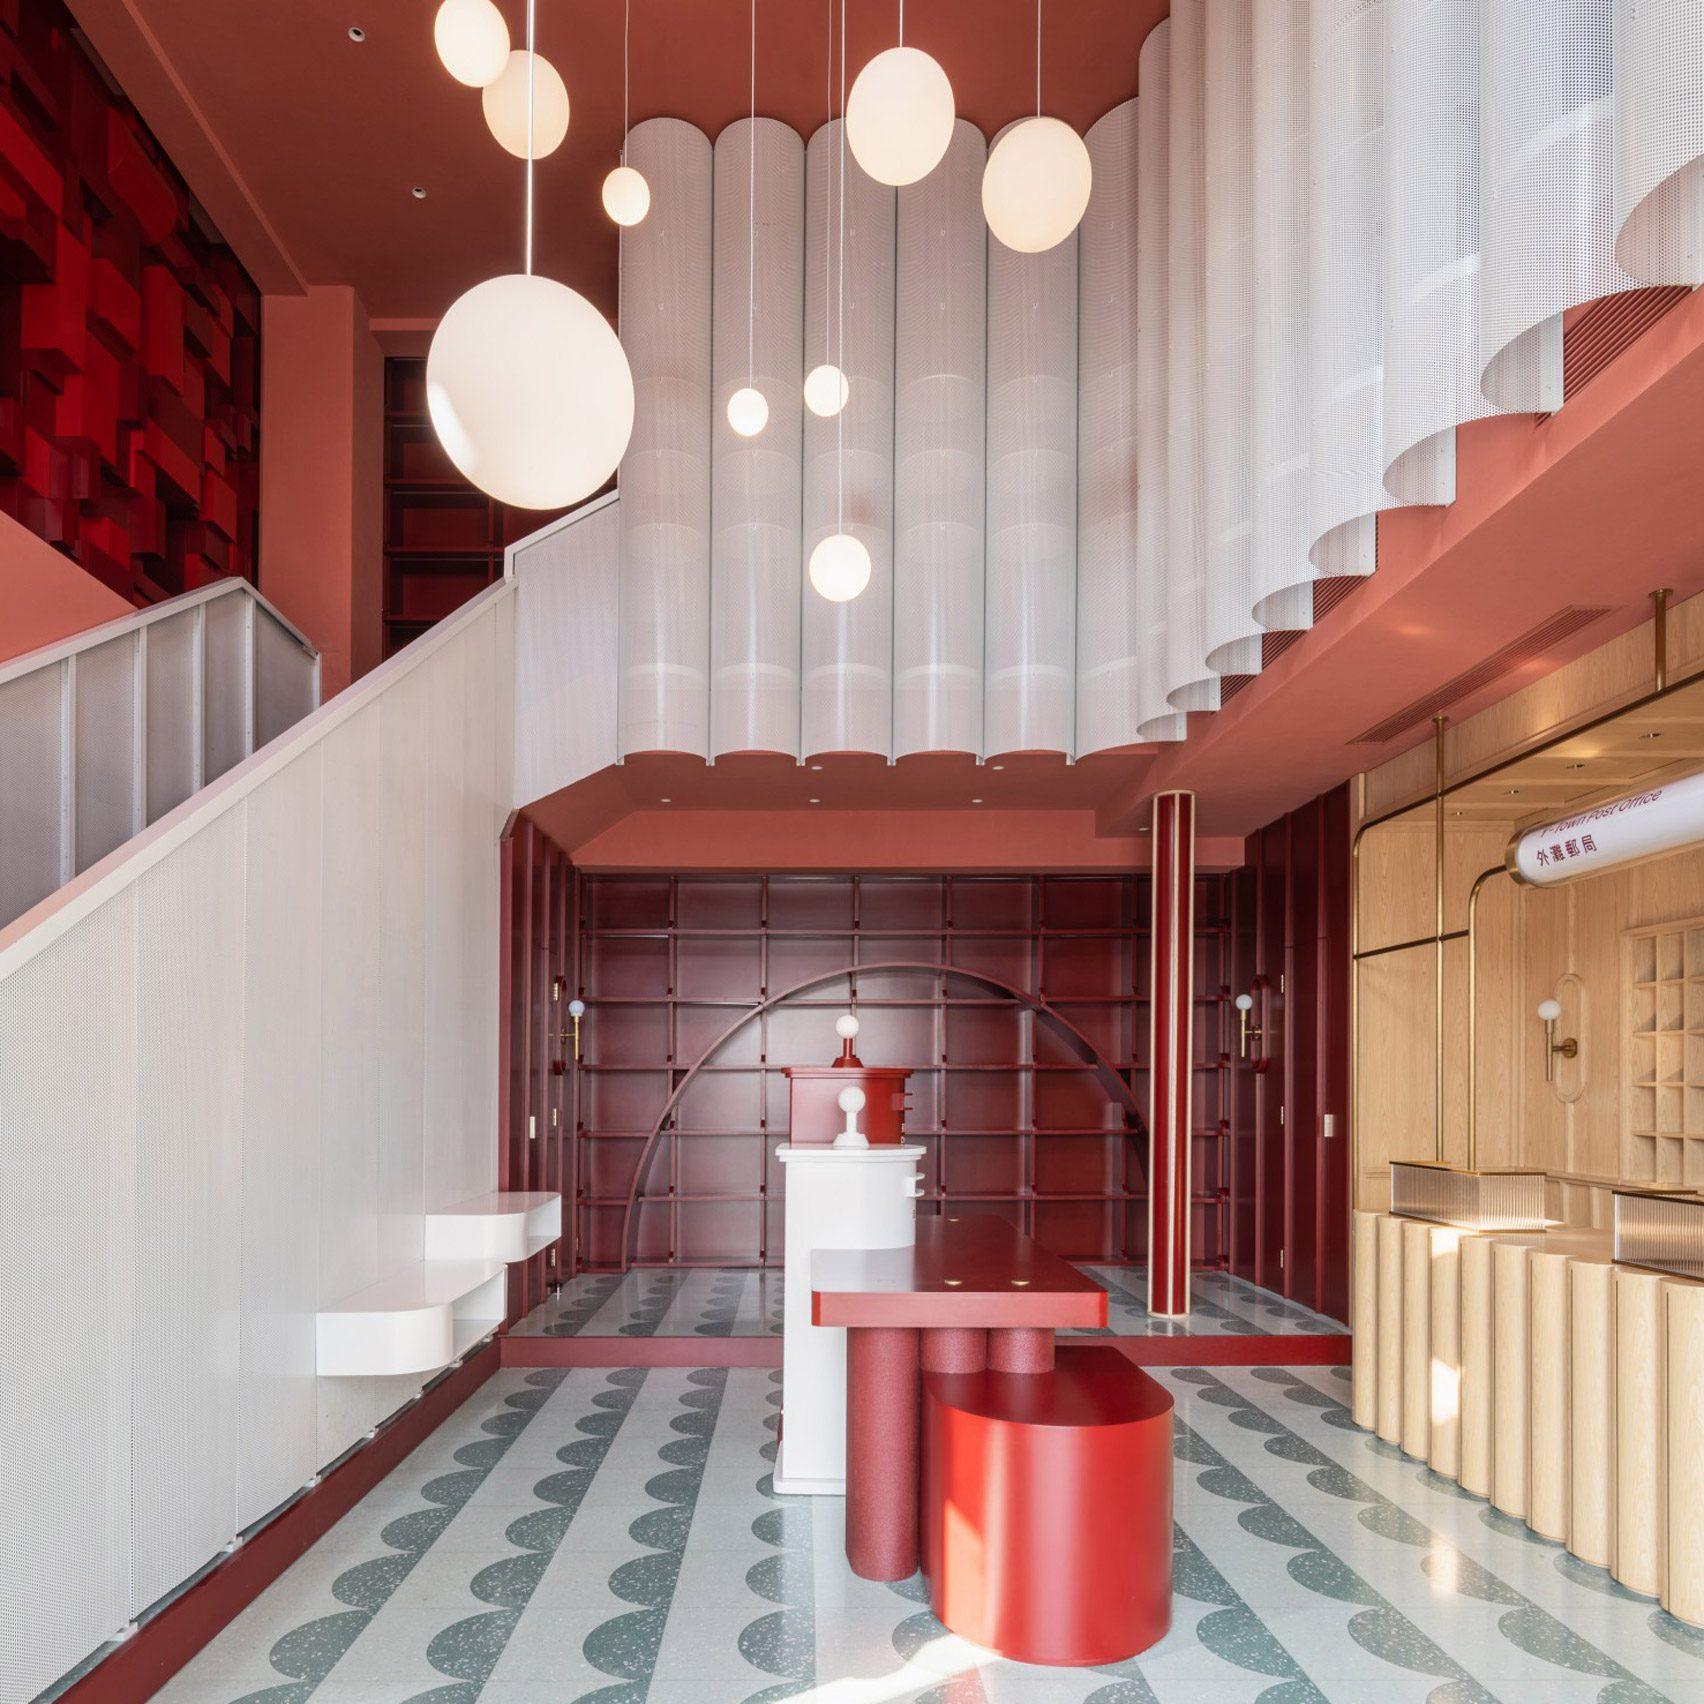 Yatufo applies festive hues to mixed-use post office in Zhejiang